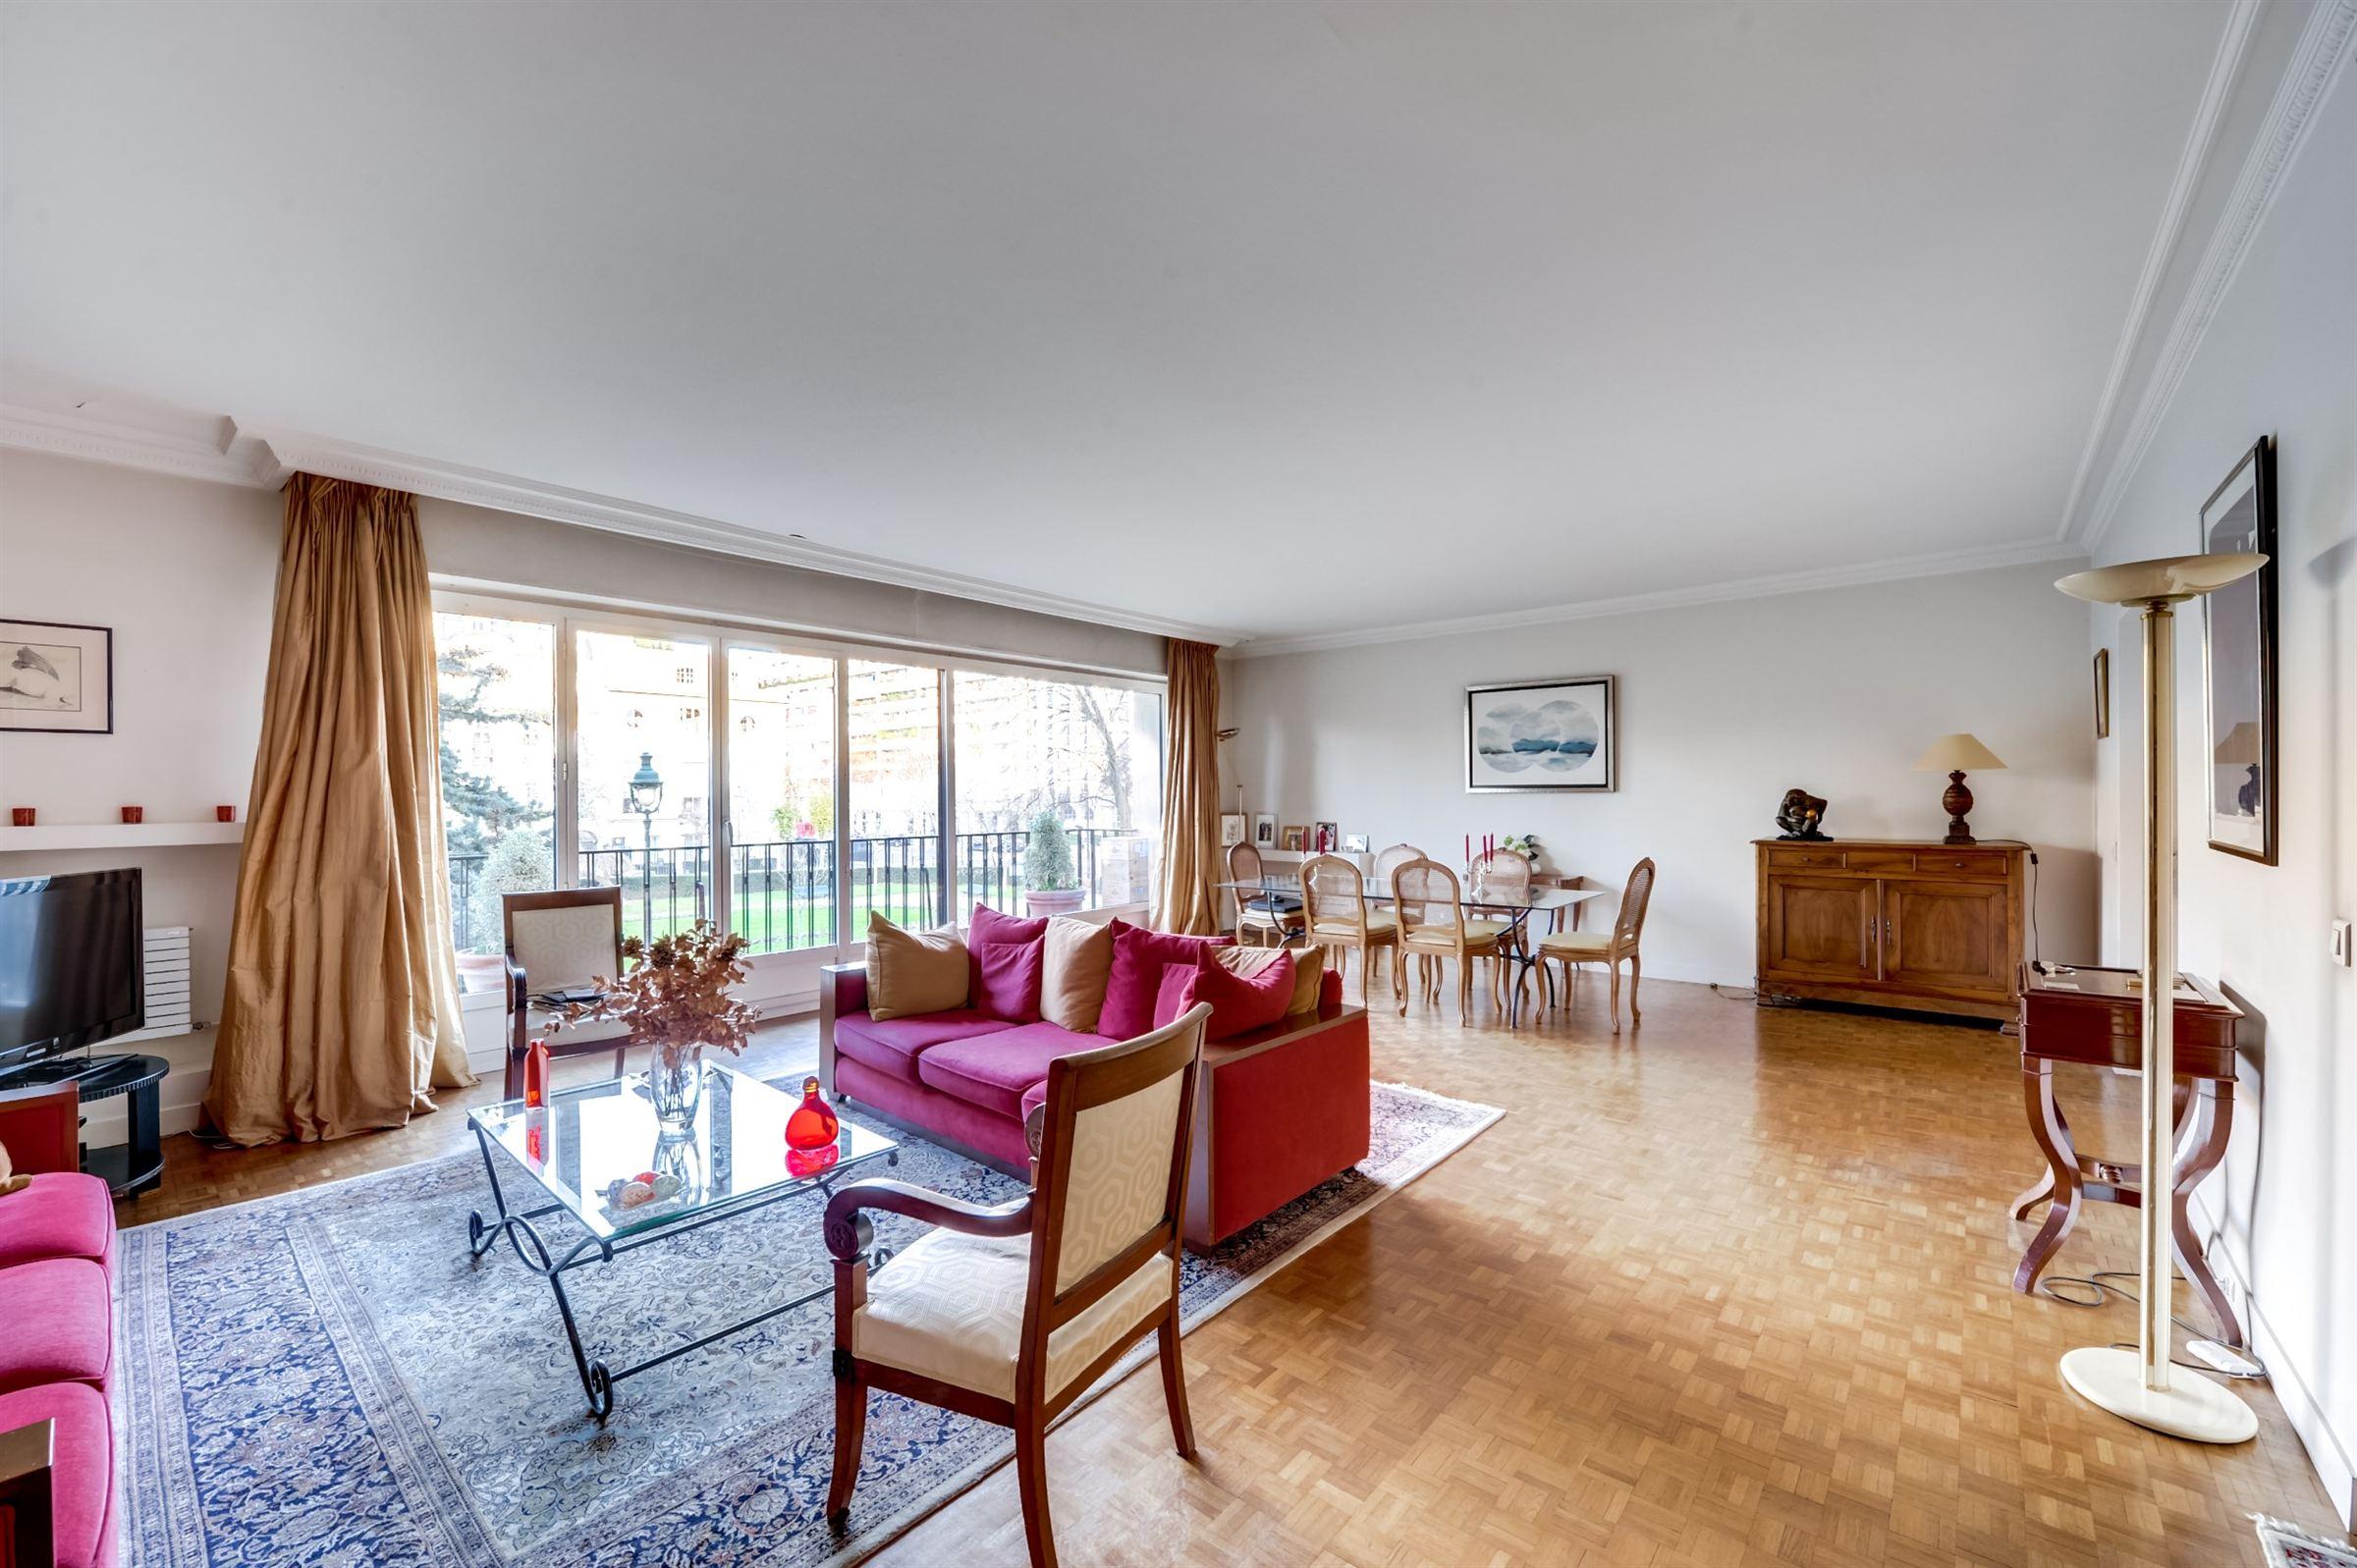 sales property at Apartment with balconies for sale in Paris 16th - Bois de Boulogne